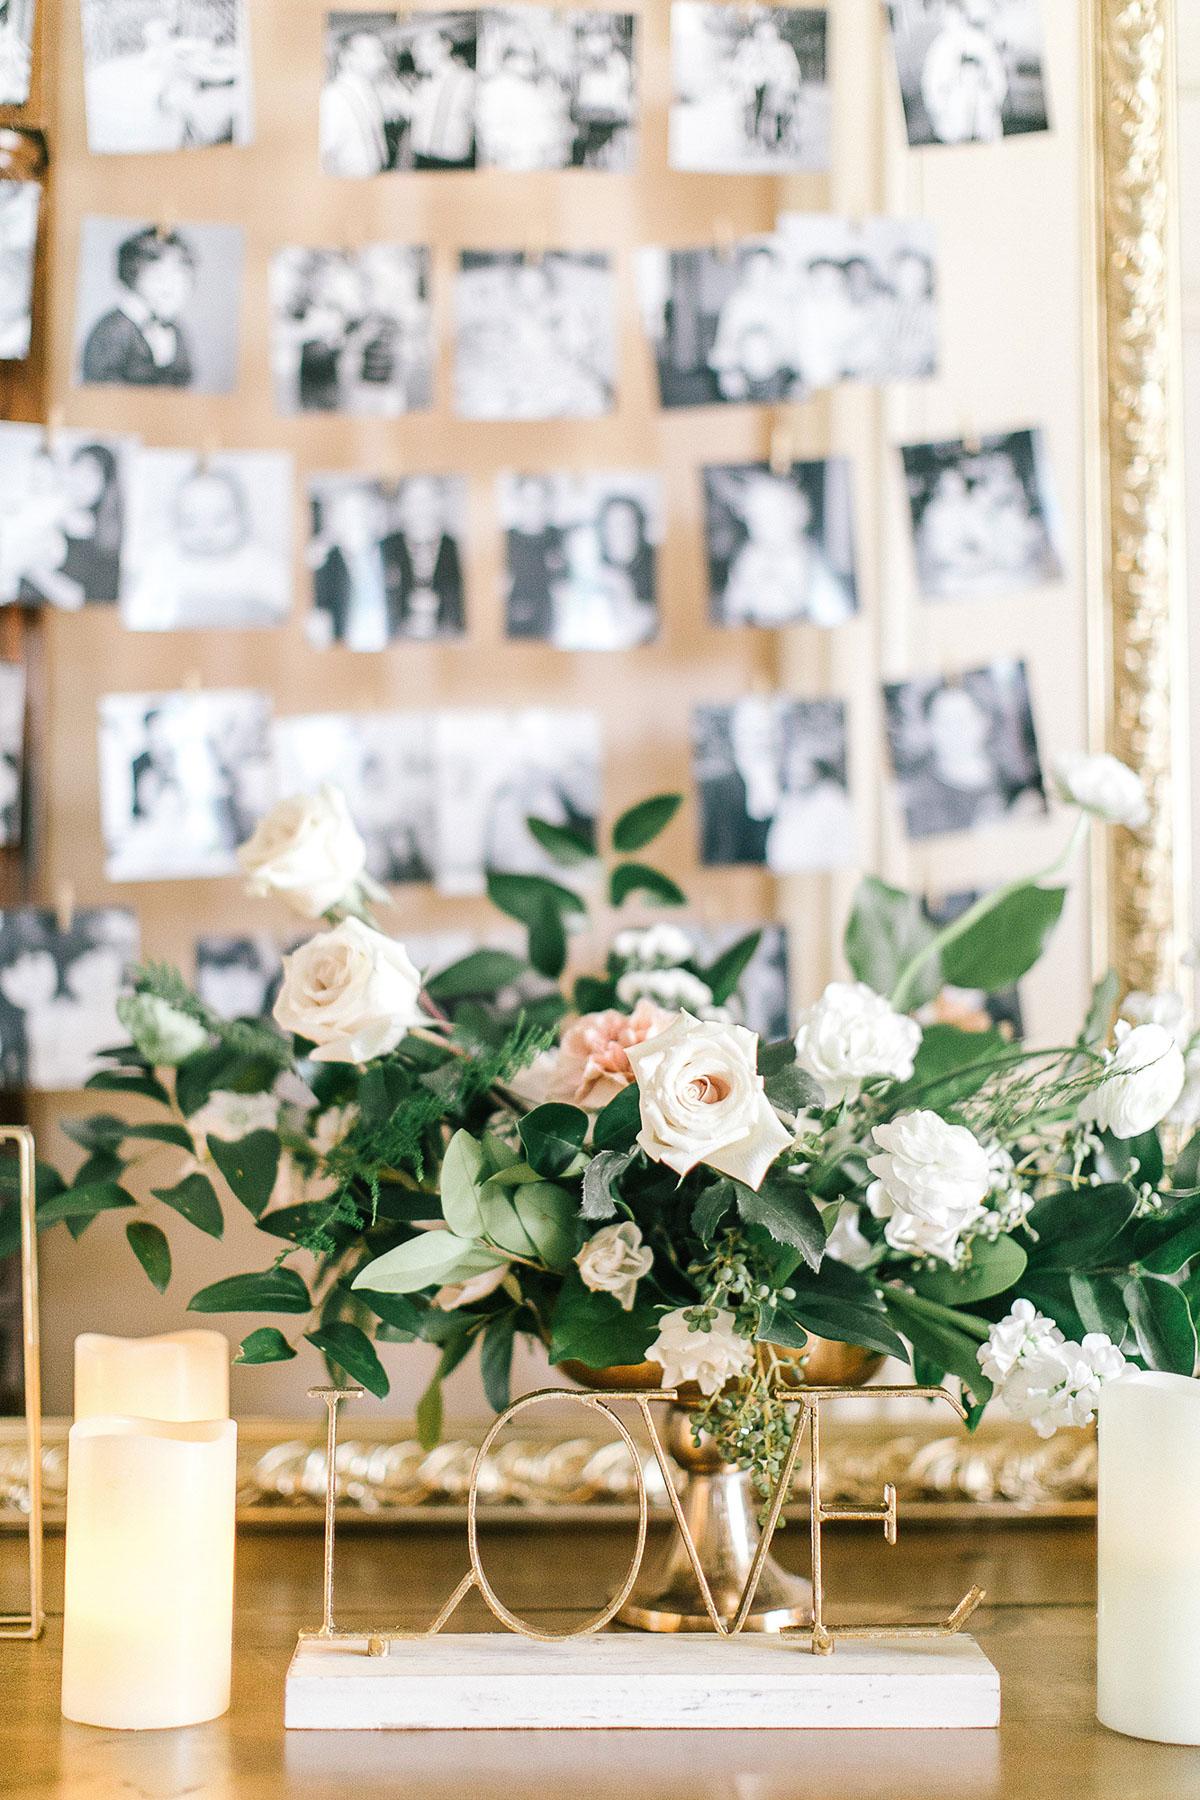 tamara-lockwood-photography-vineyard-bride-swish-list-the-old-courthouse-niagara-on-the-lake-wedding-46.jpg